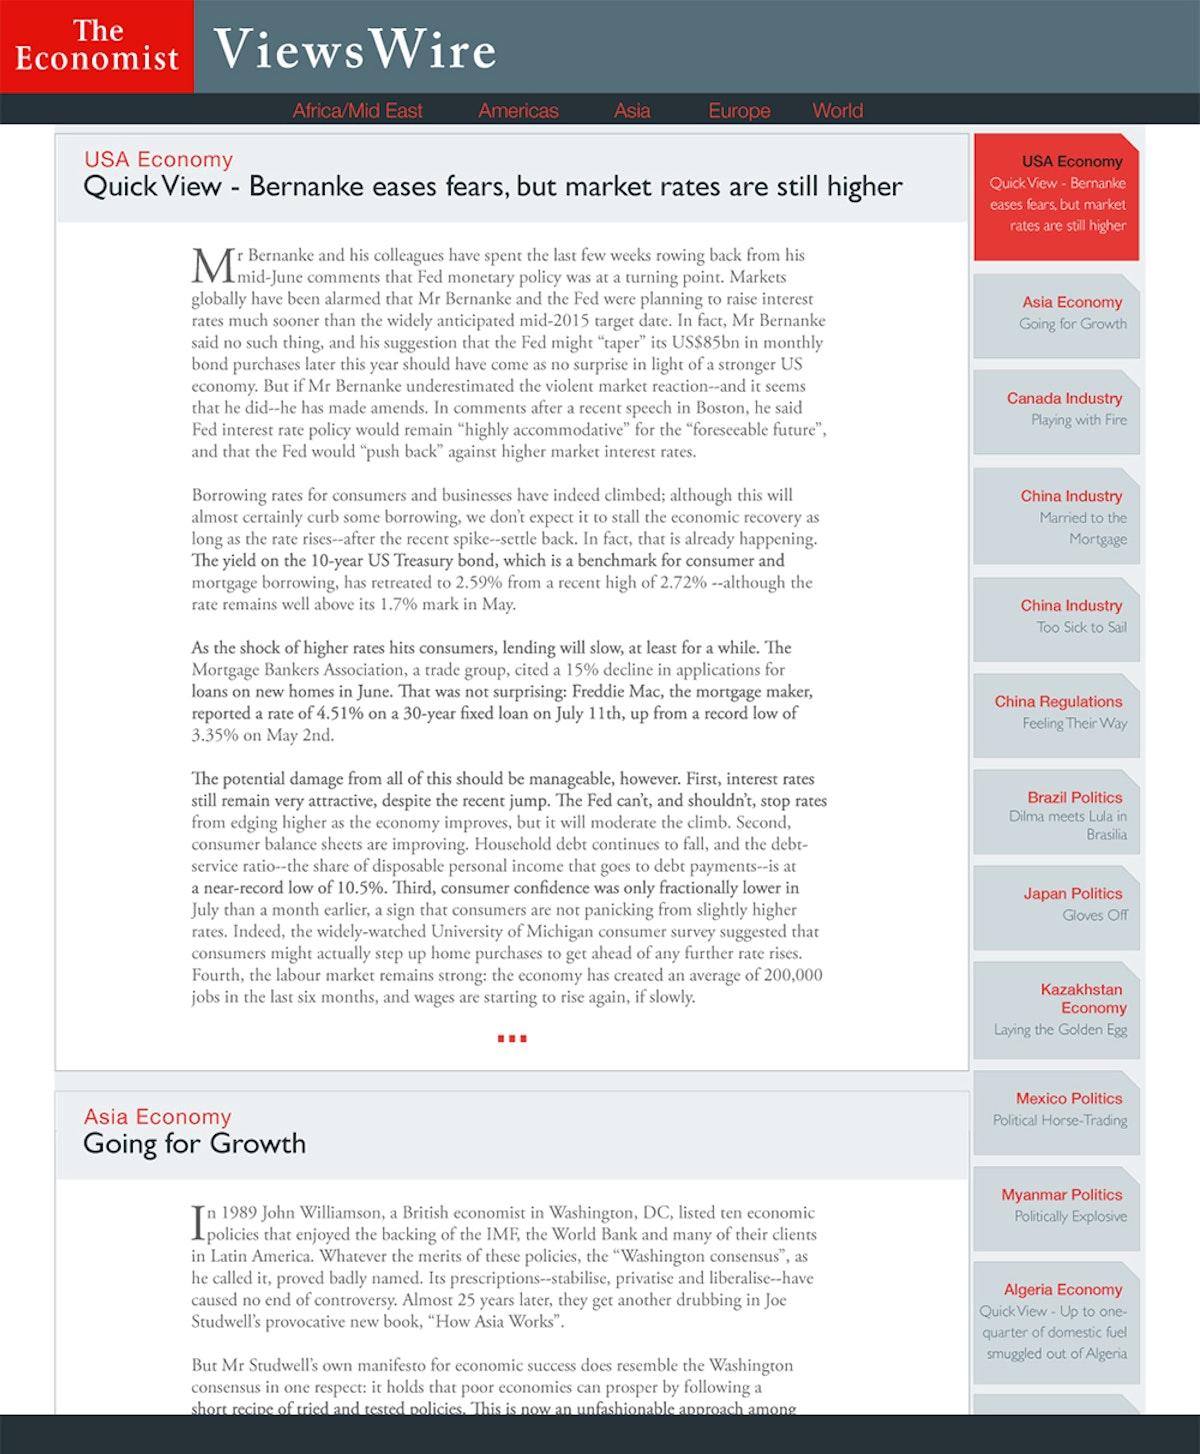 The Economist Viewswire